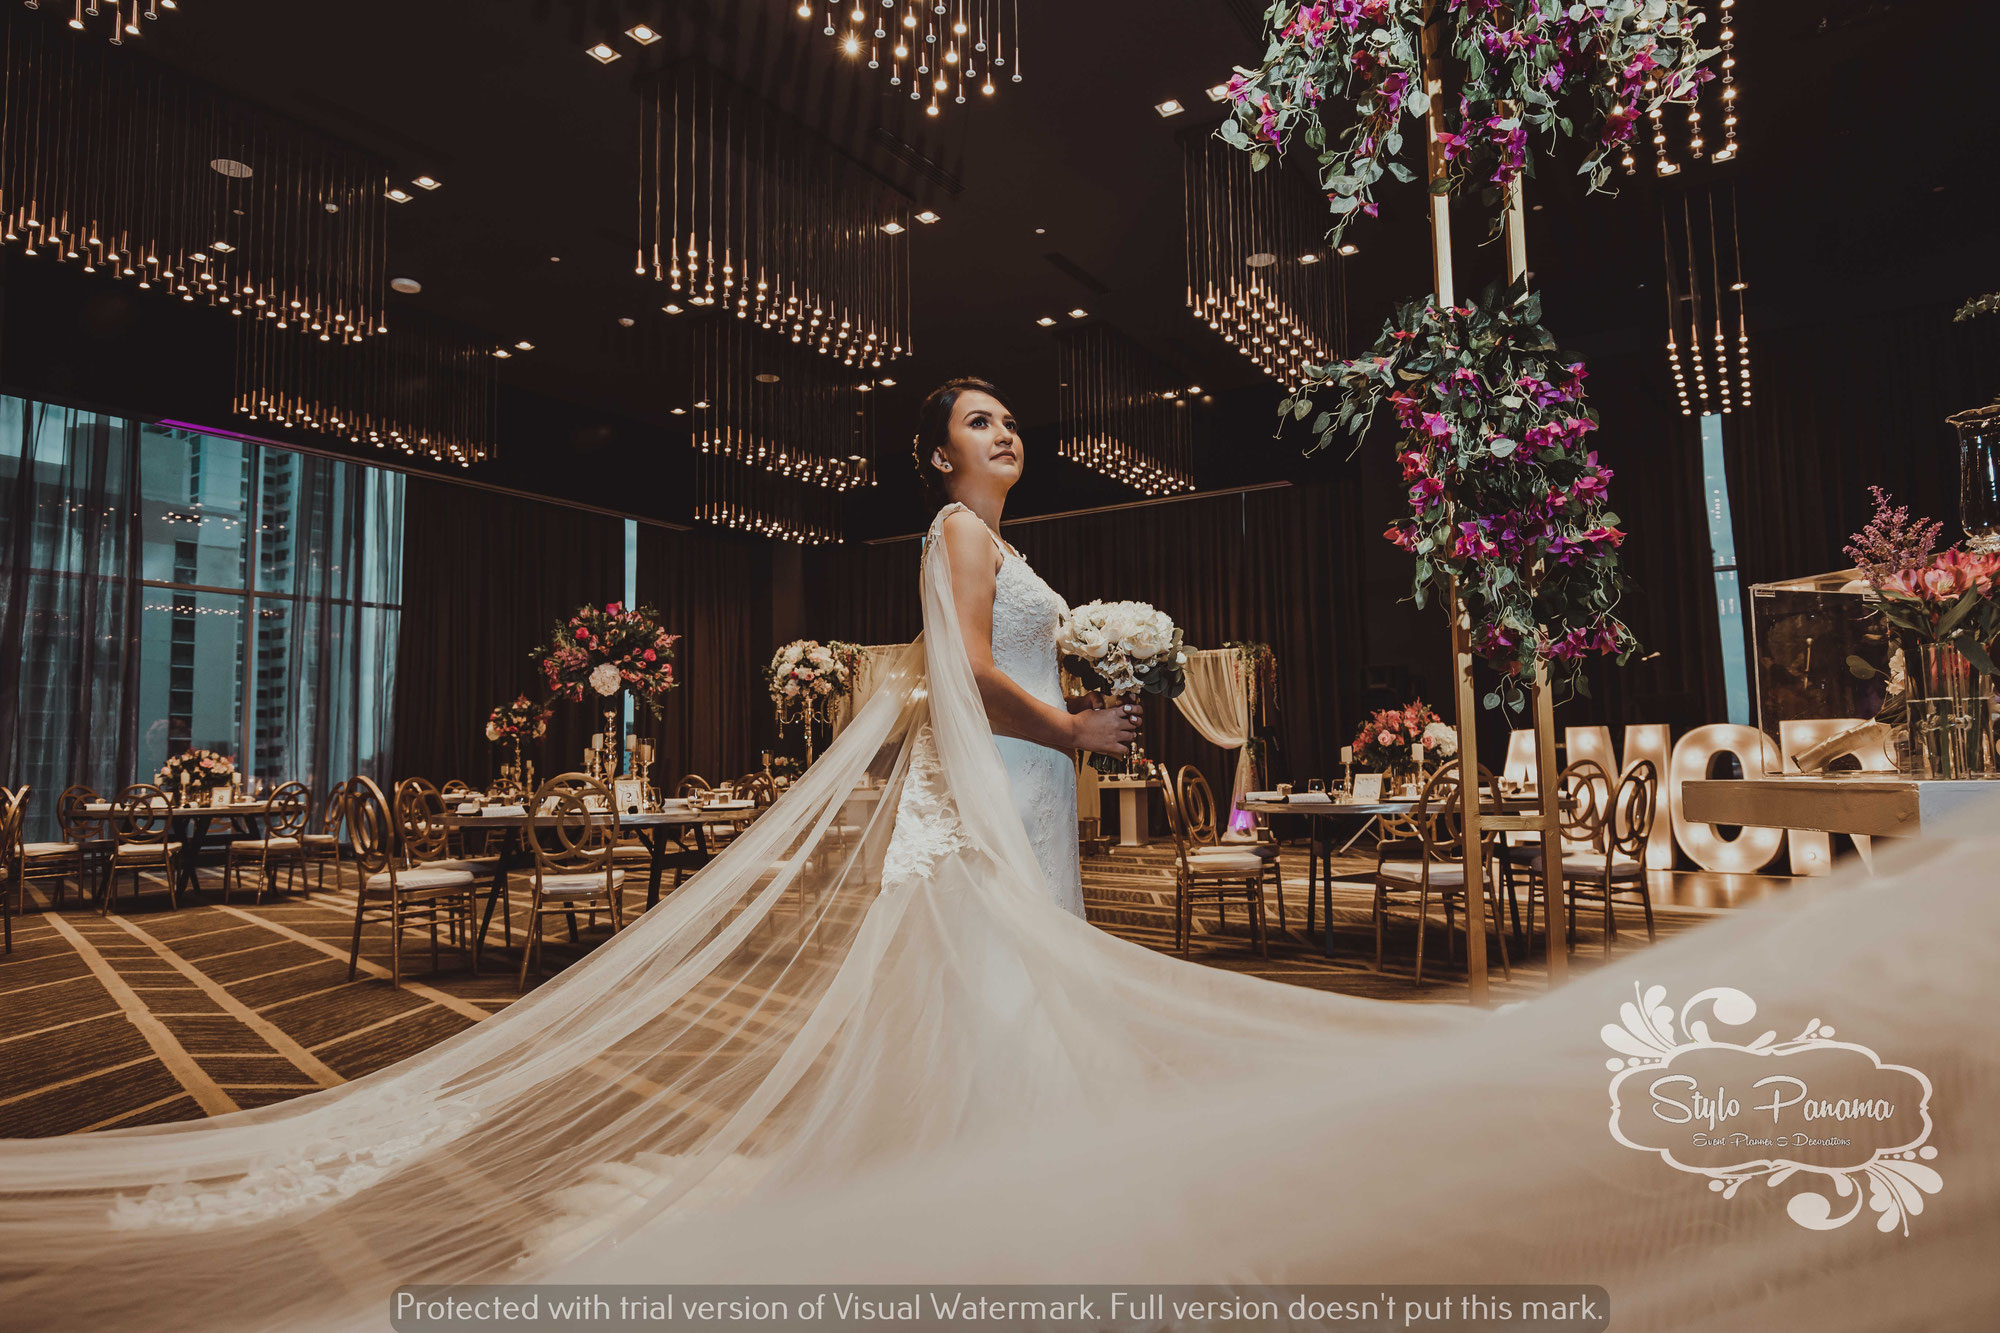 Donde será tu boda?